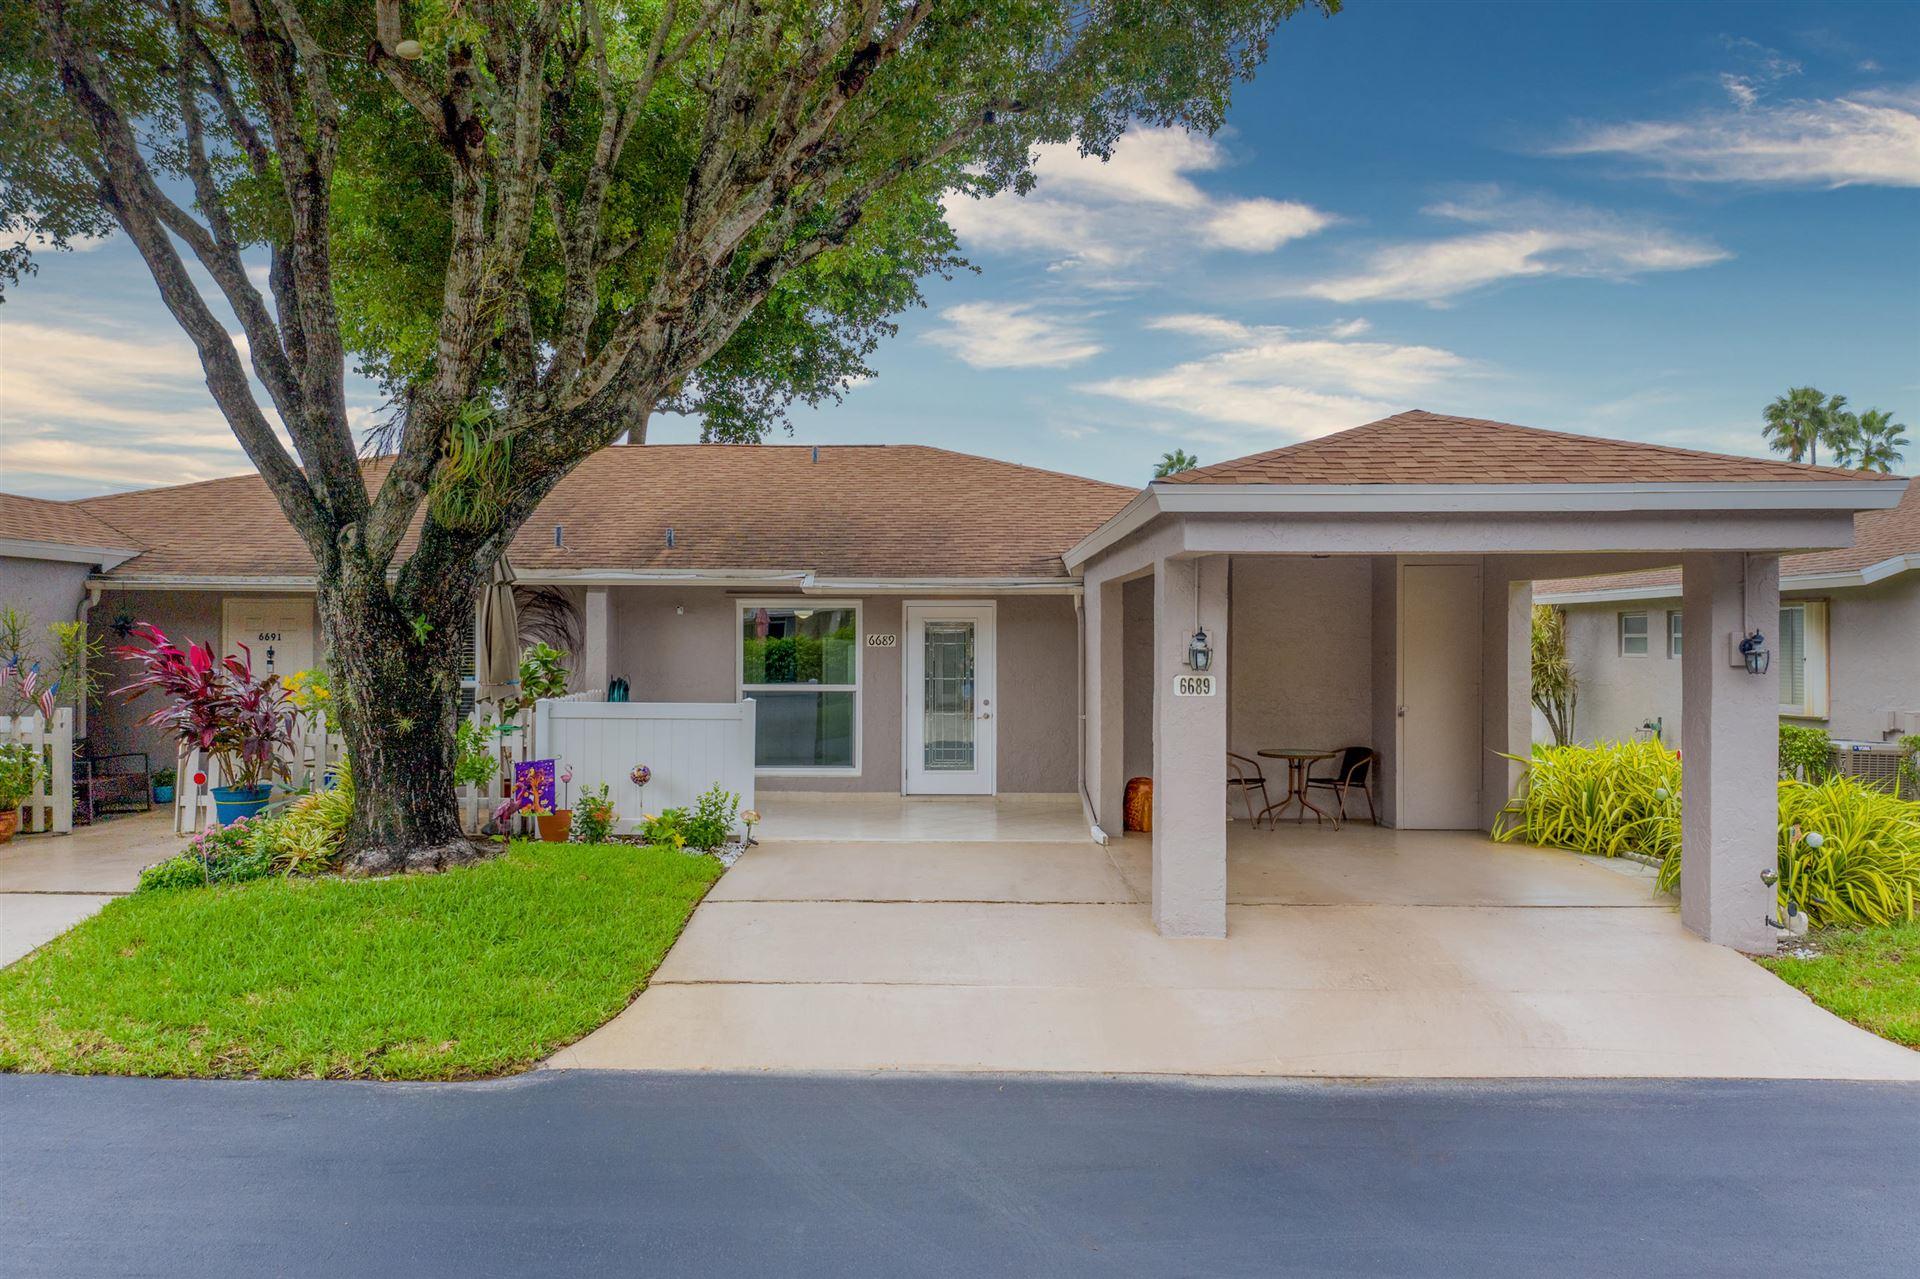 6689 Moonlit Drive, Delray Beach, FL 33446 - #: RX-10667235